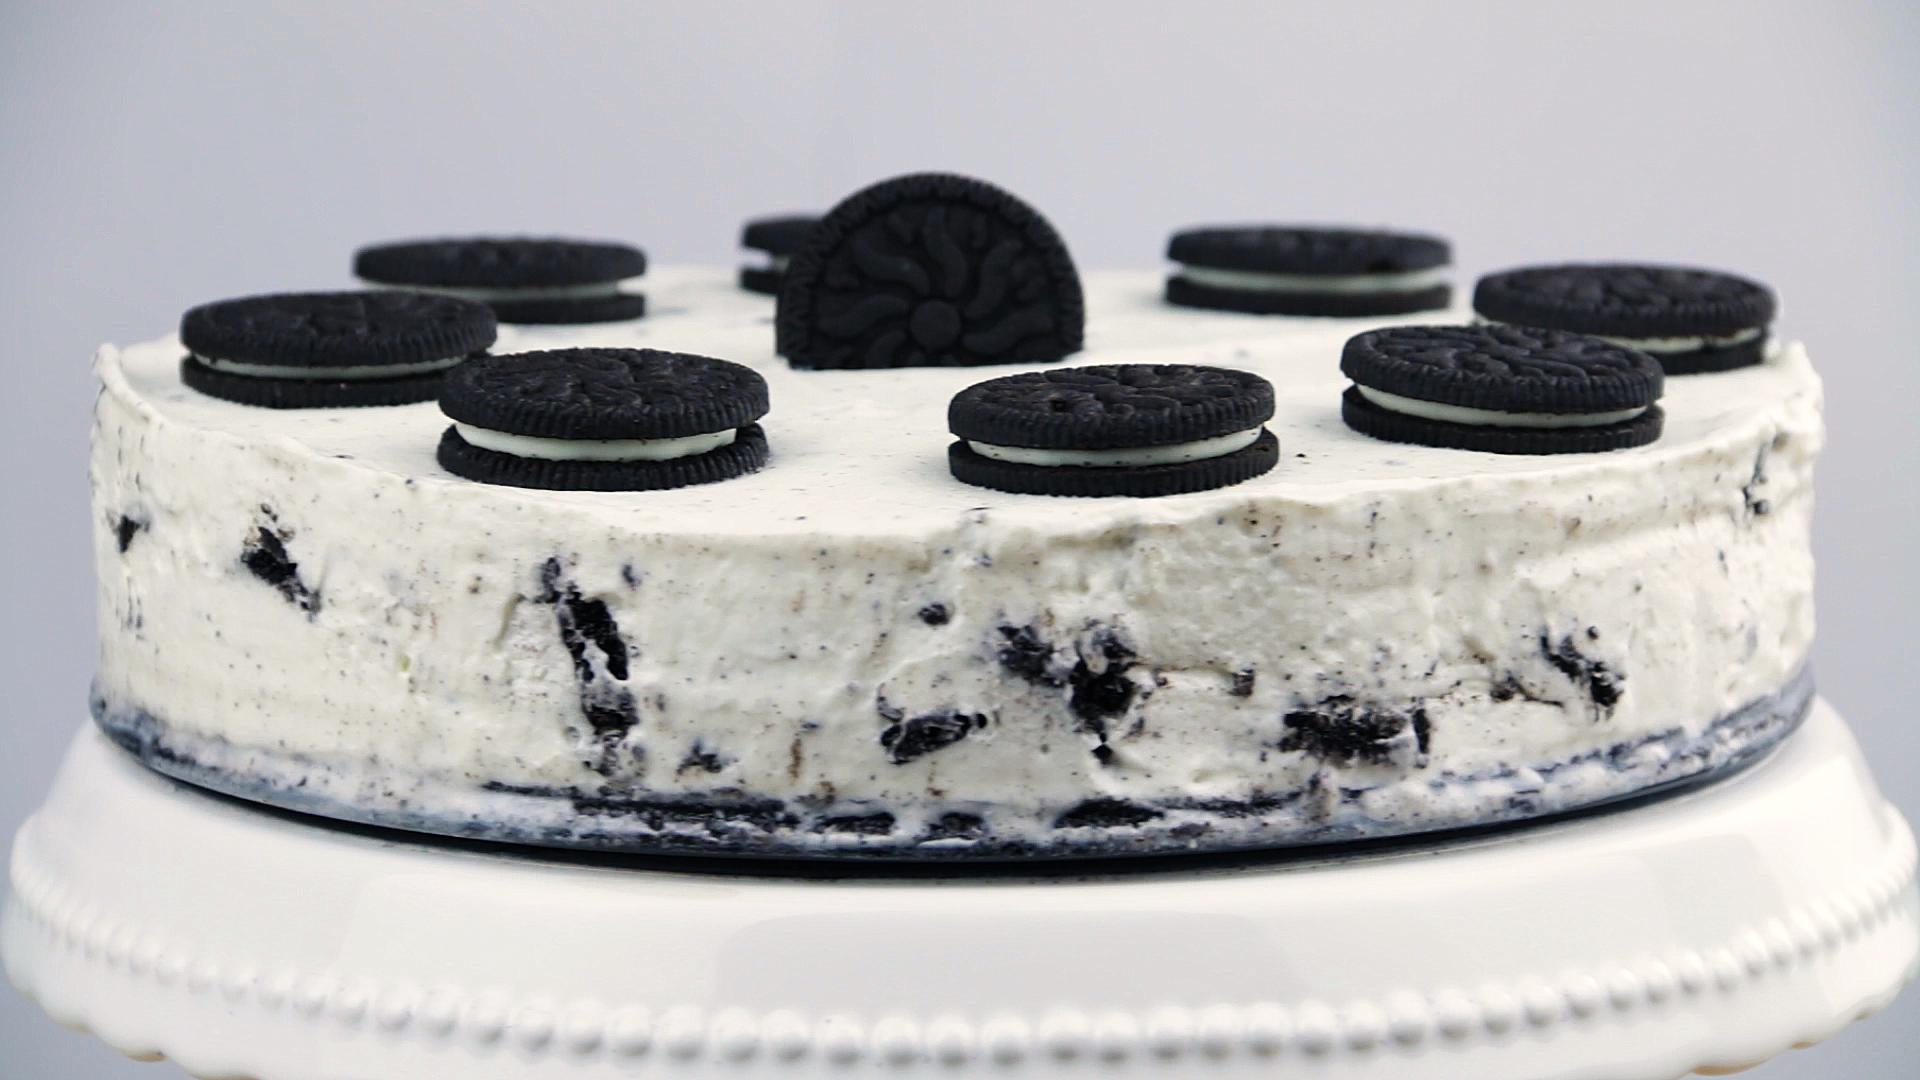 Oreo Kuchen Ist Das Perfekte Kasekuchen Rezept Ohne Backen